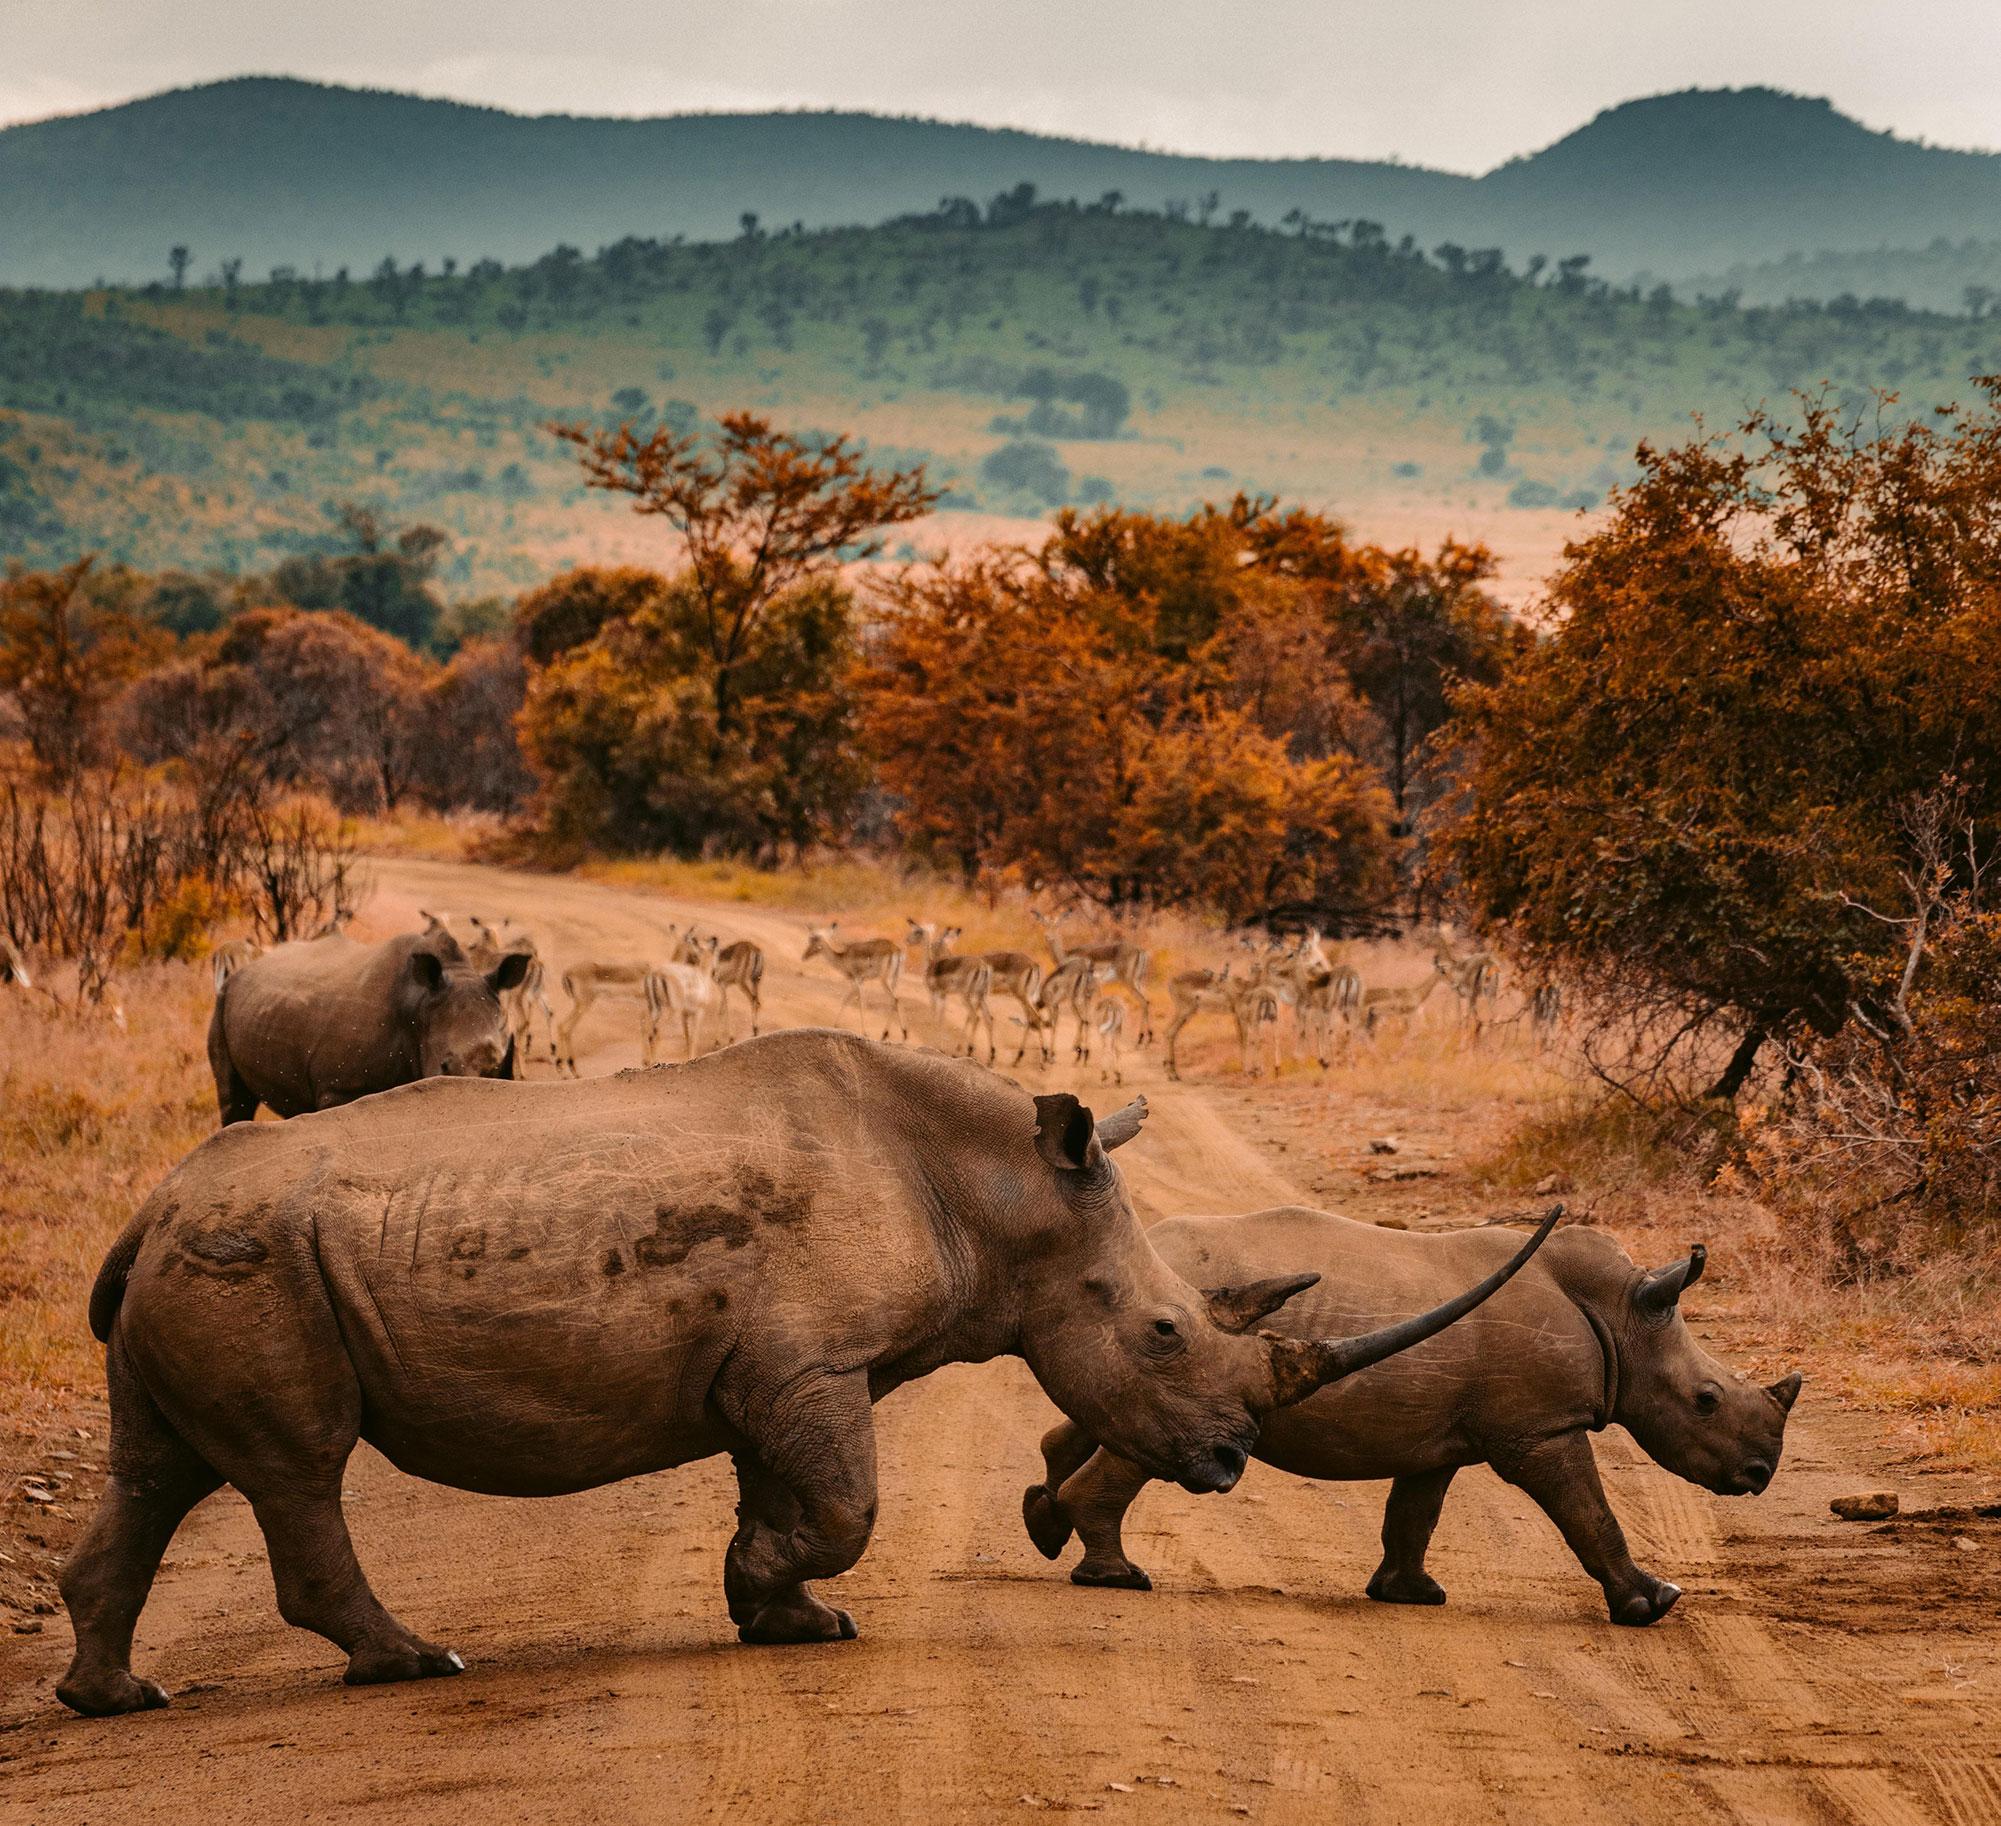 Aren't all Rhinos grey?